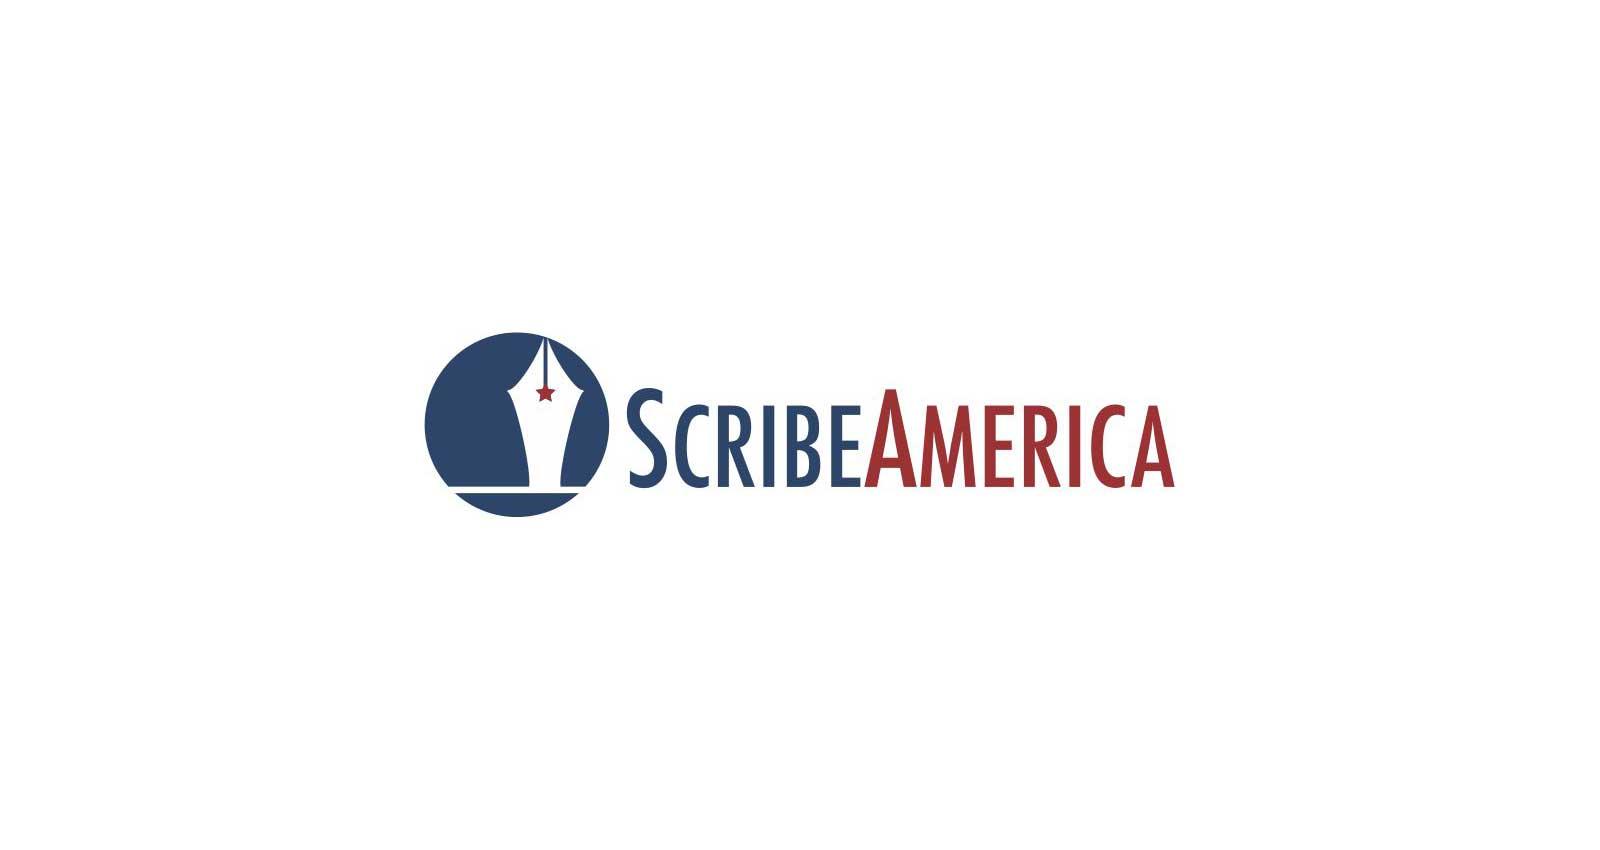 ScribeAmerica logo